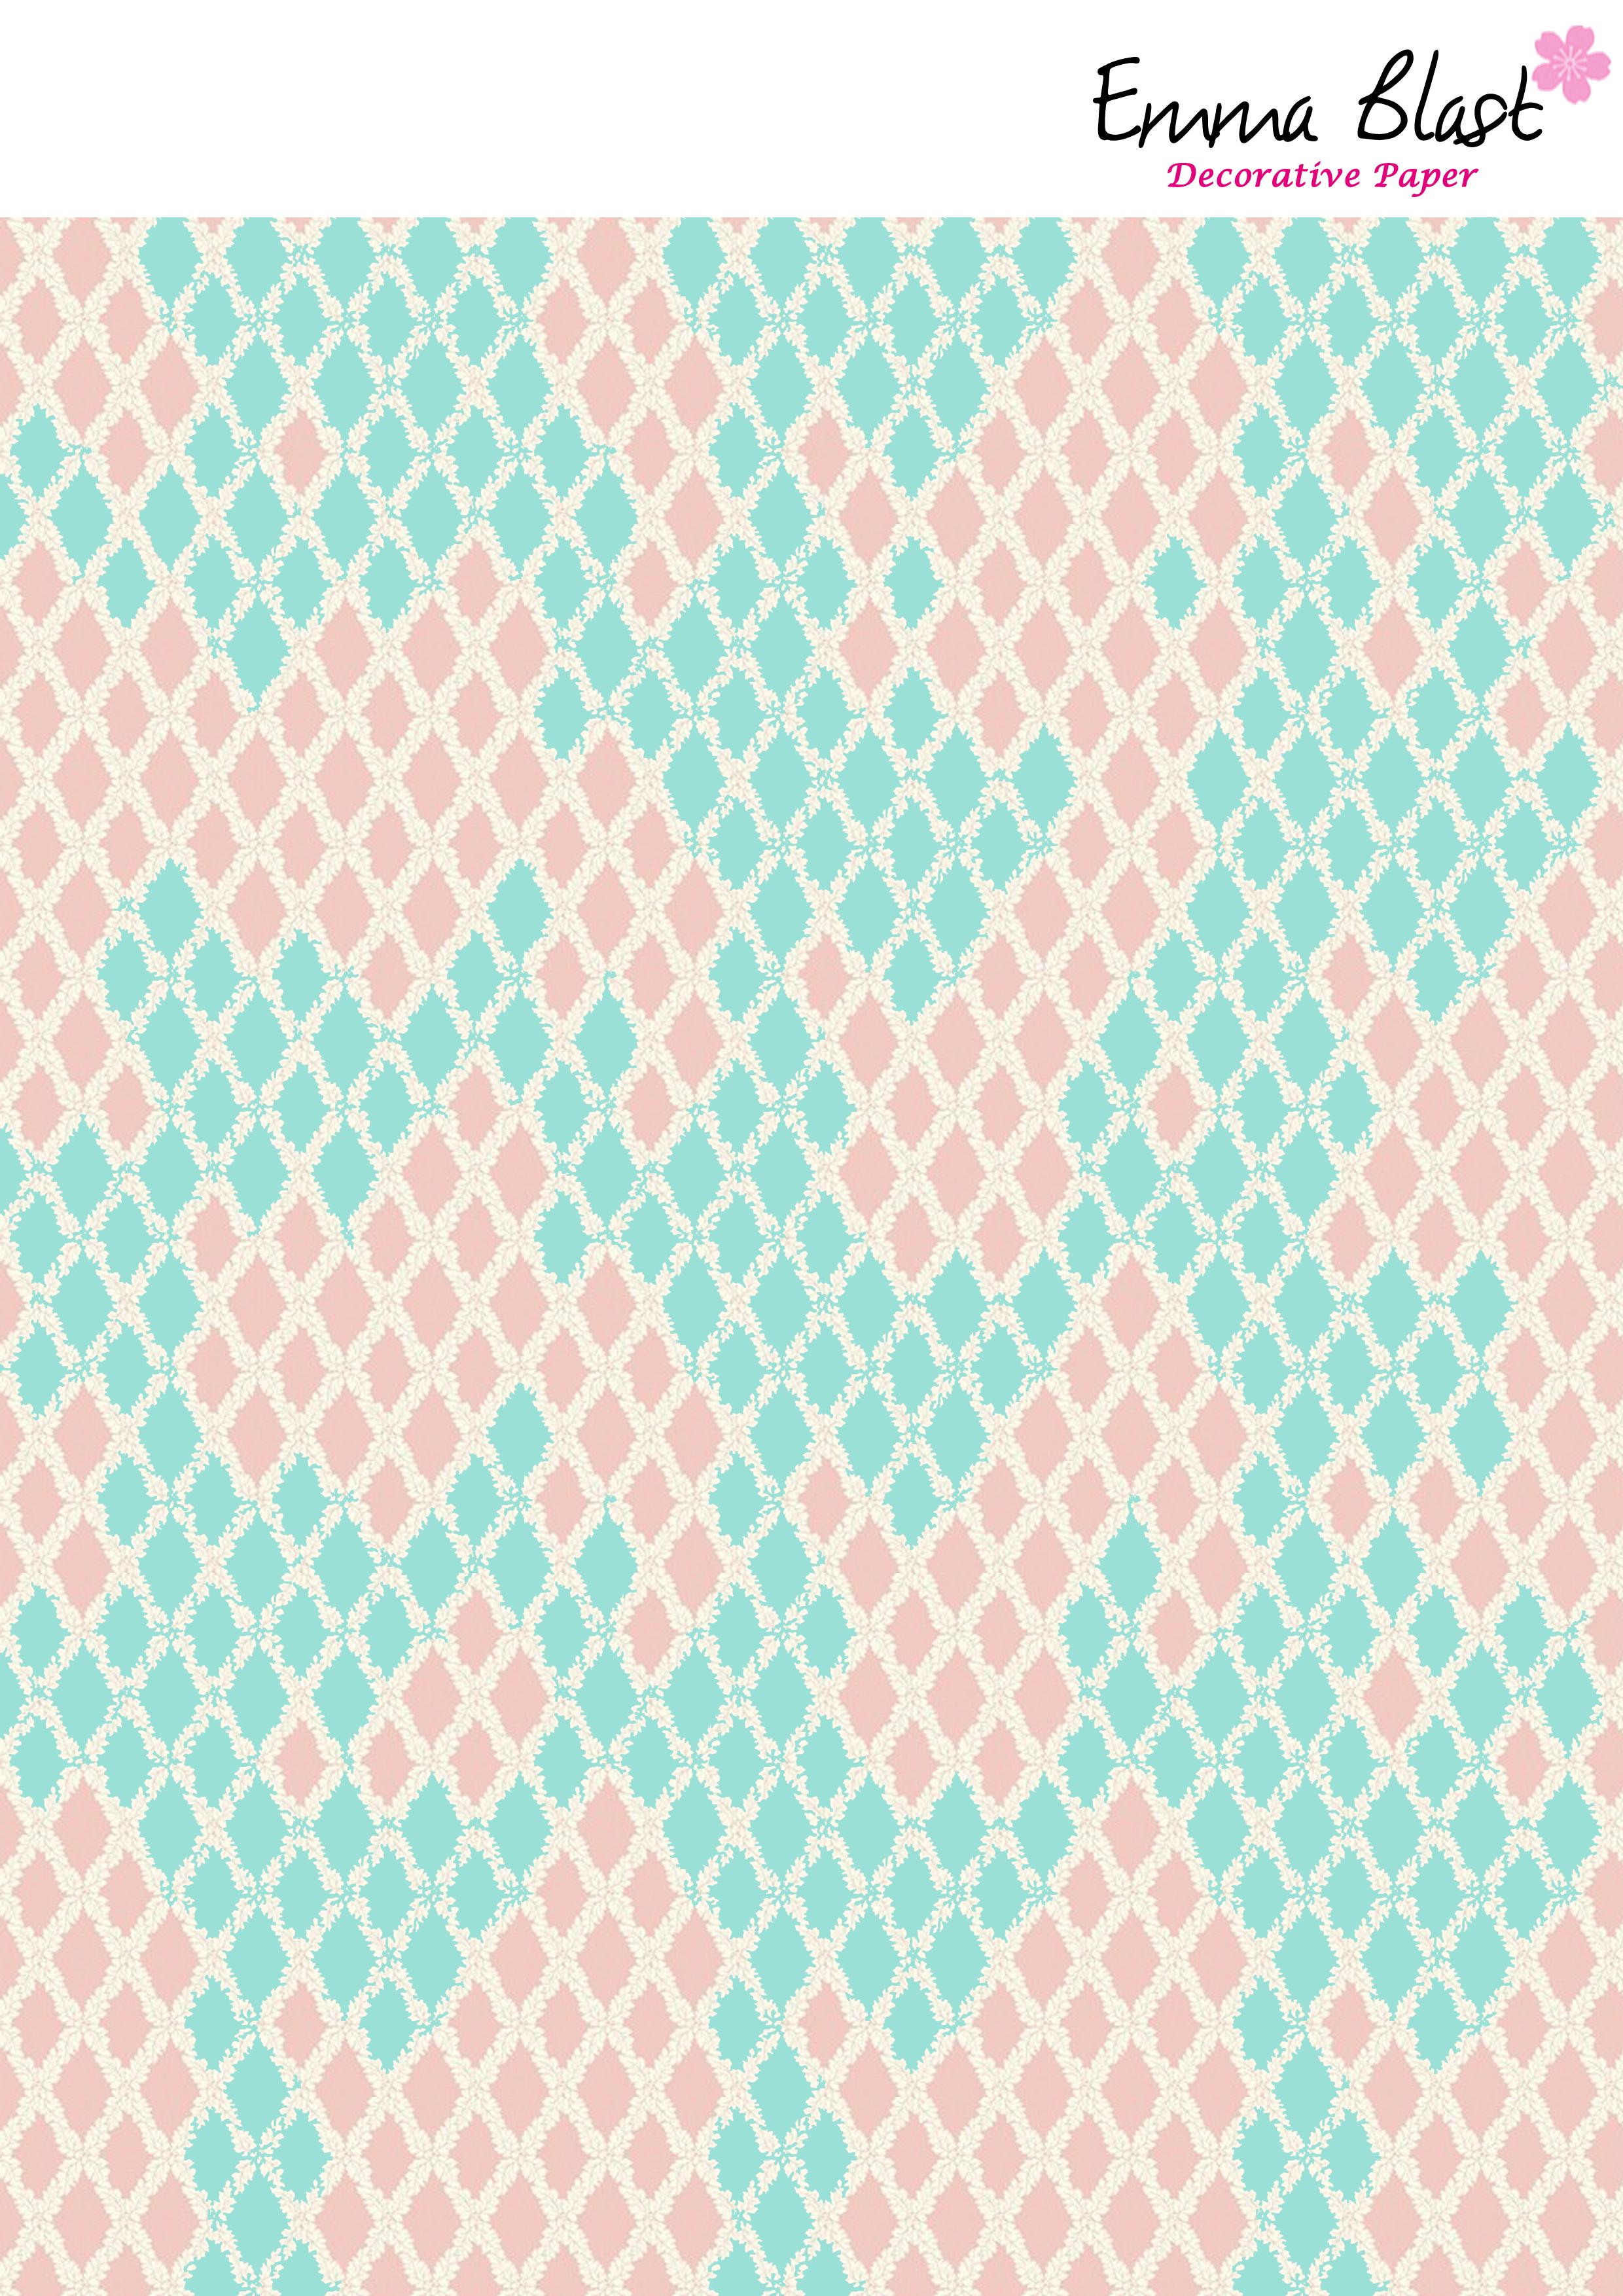 decorative paper 38 pattern 38 papel deco by emmablast